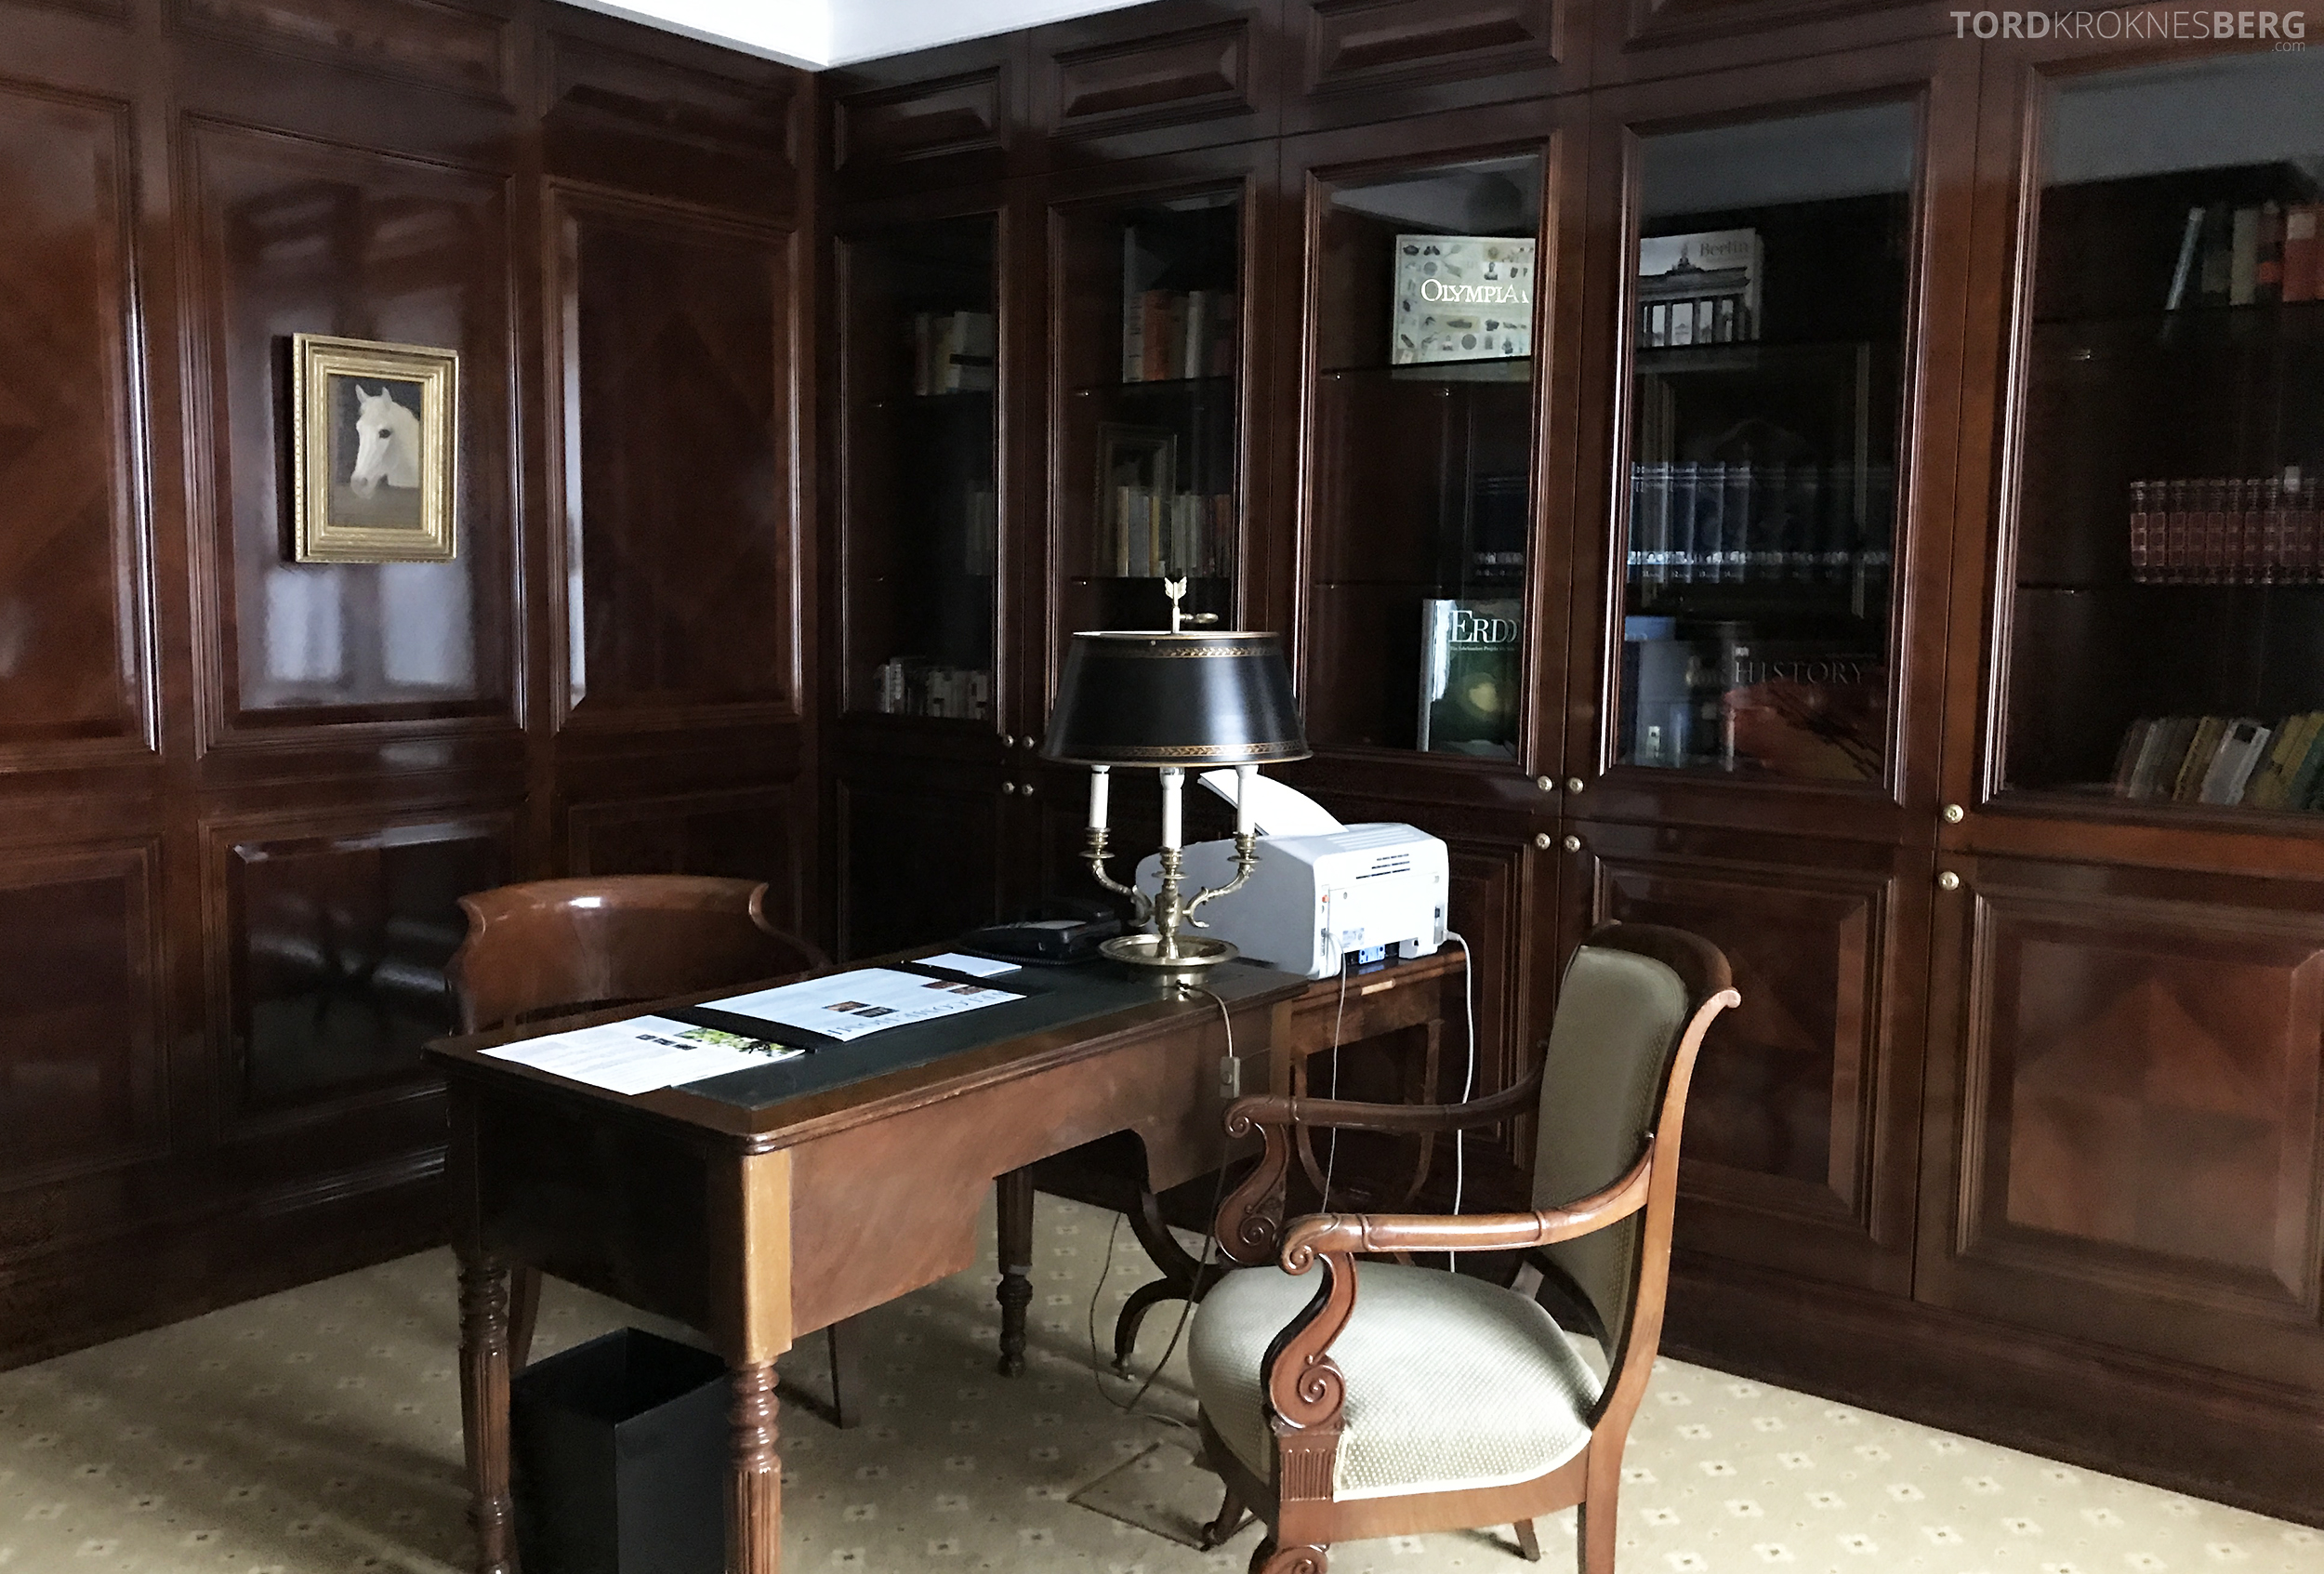 Ritz-Carlton Berlin Presidential Suite kontor